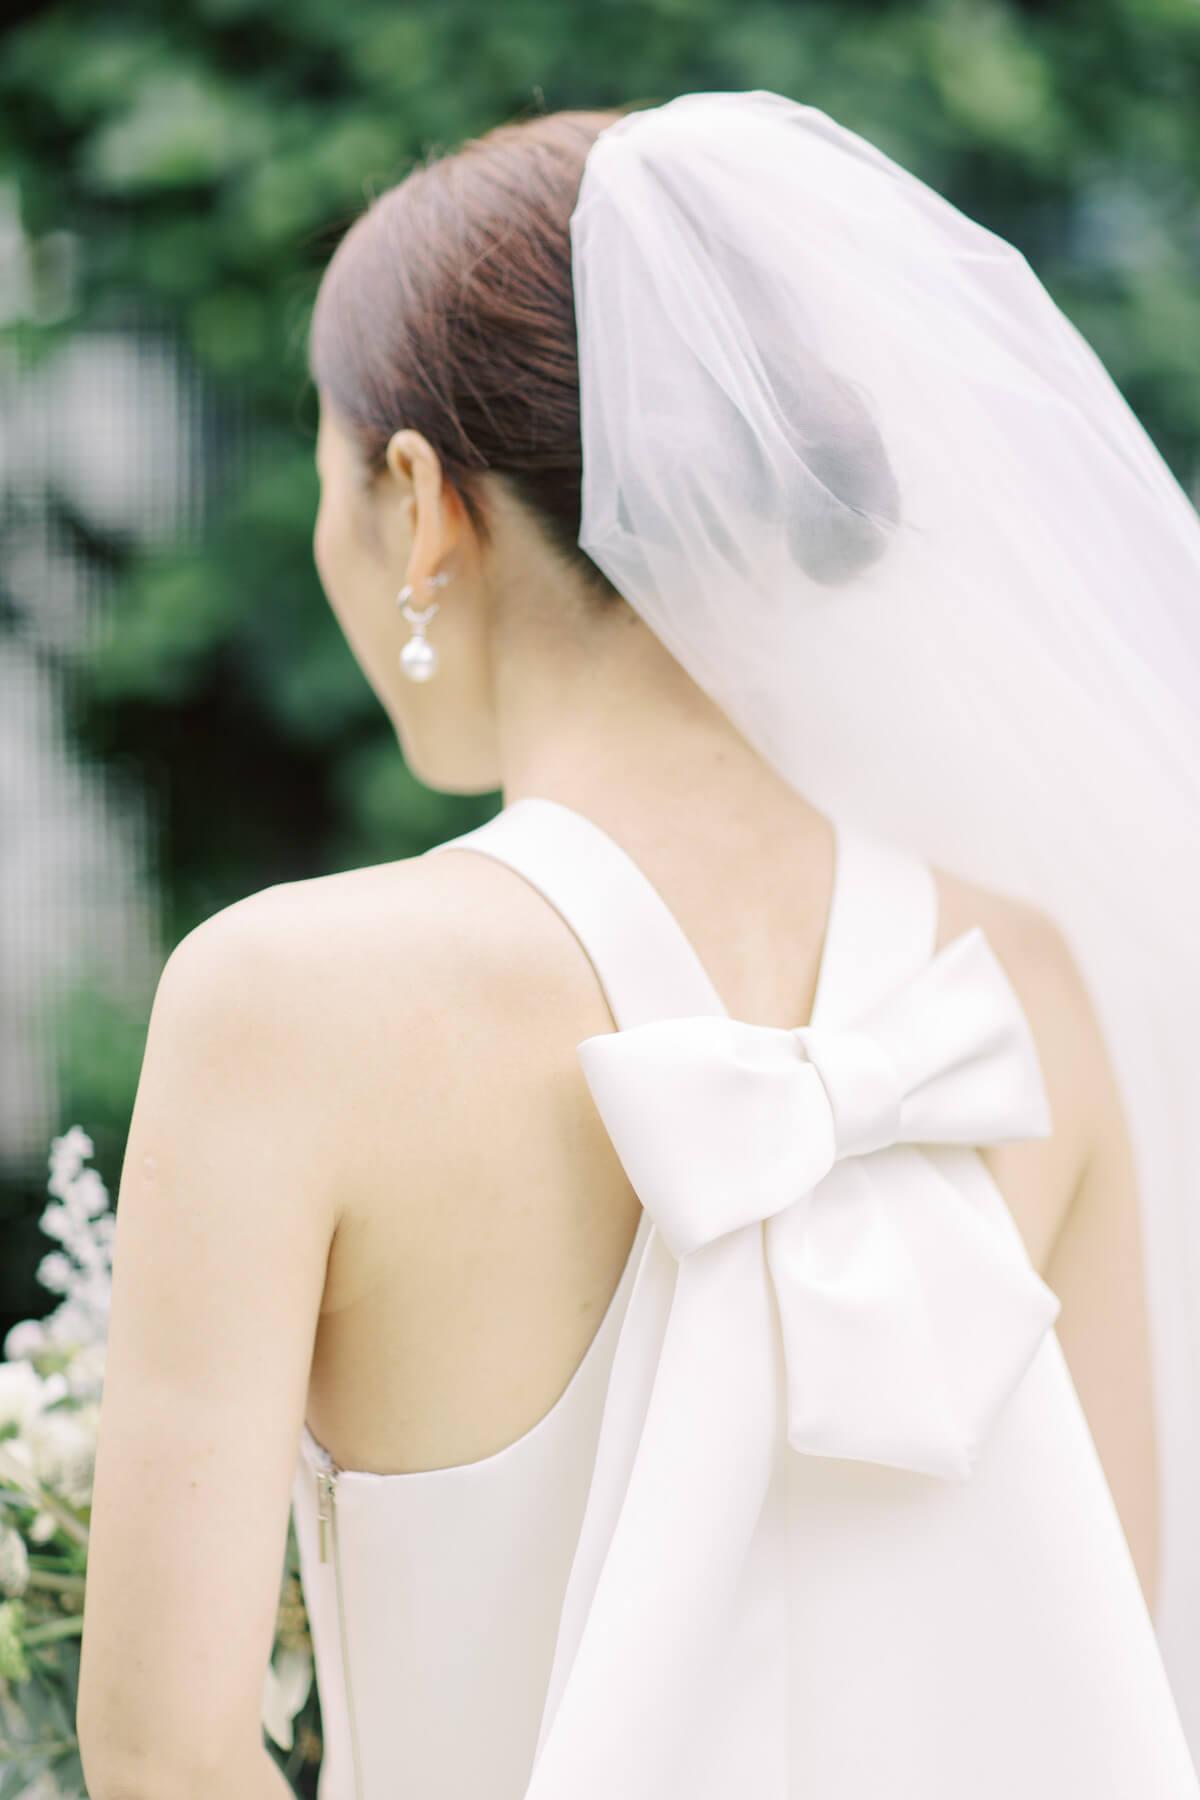 nikkiloveu-hongkong-weddingday-theupperhouse-as-020.jpg